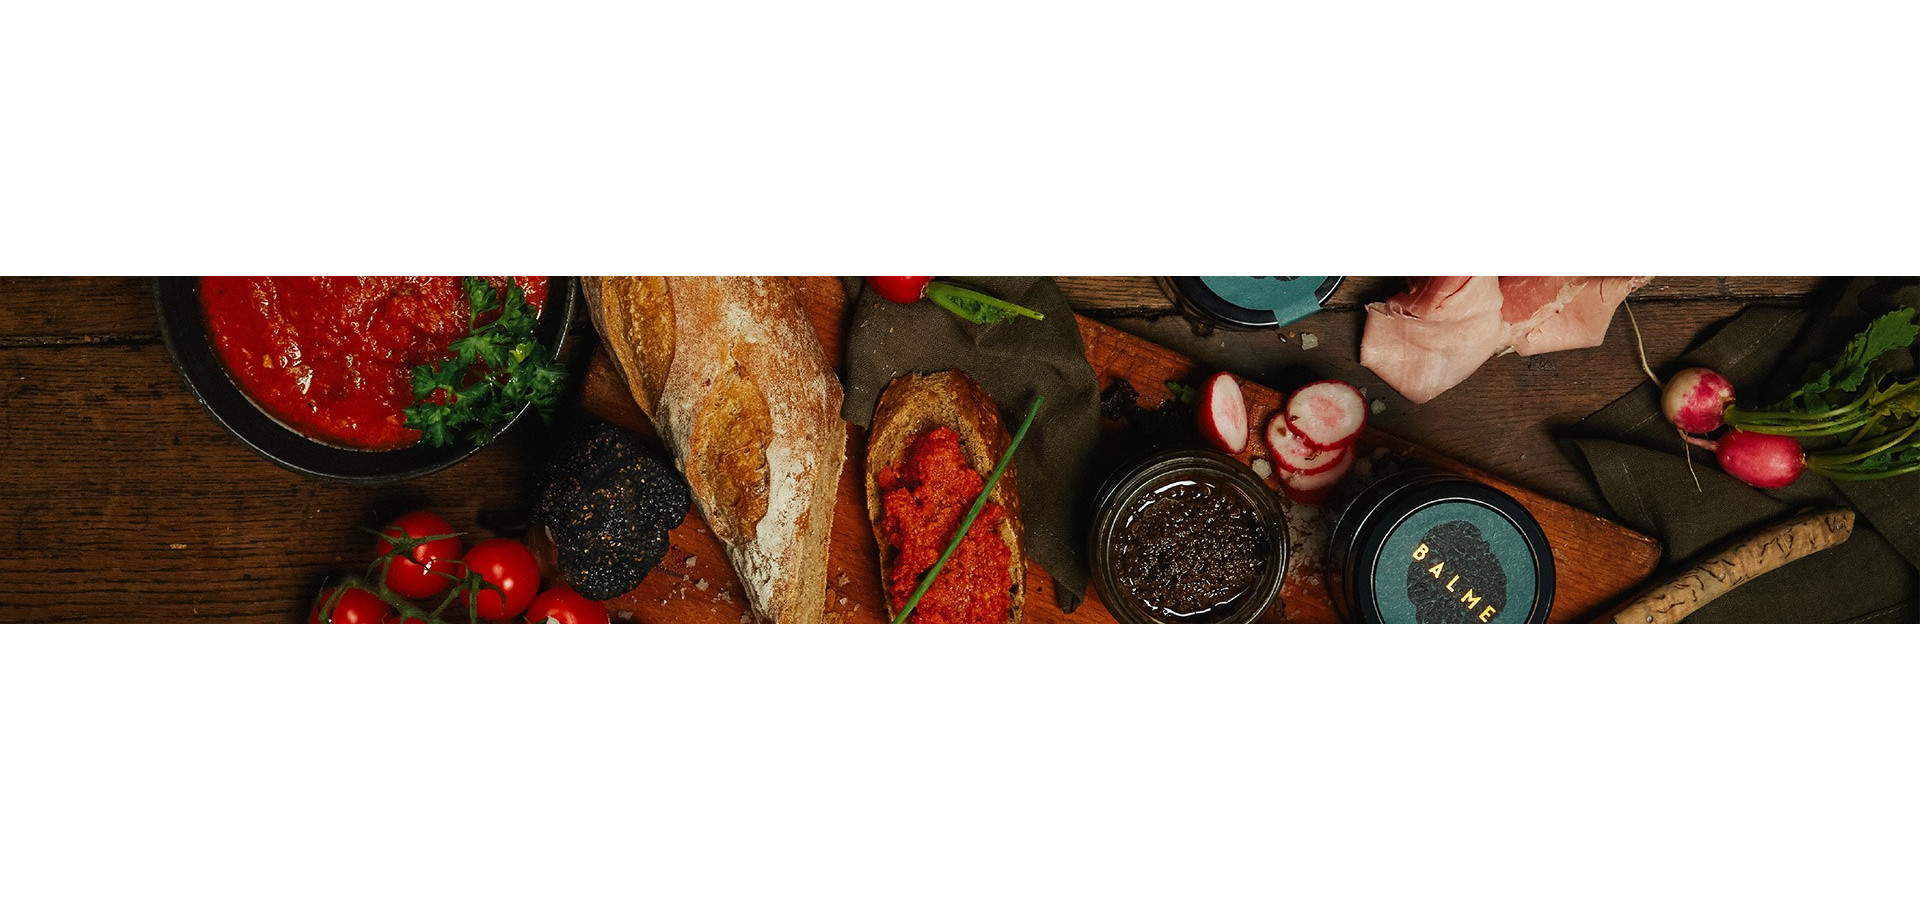 Apéritif à la Truffe : jambon truffe ou saucisson truffe pour l'apéro?